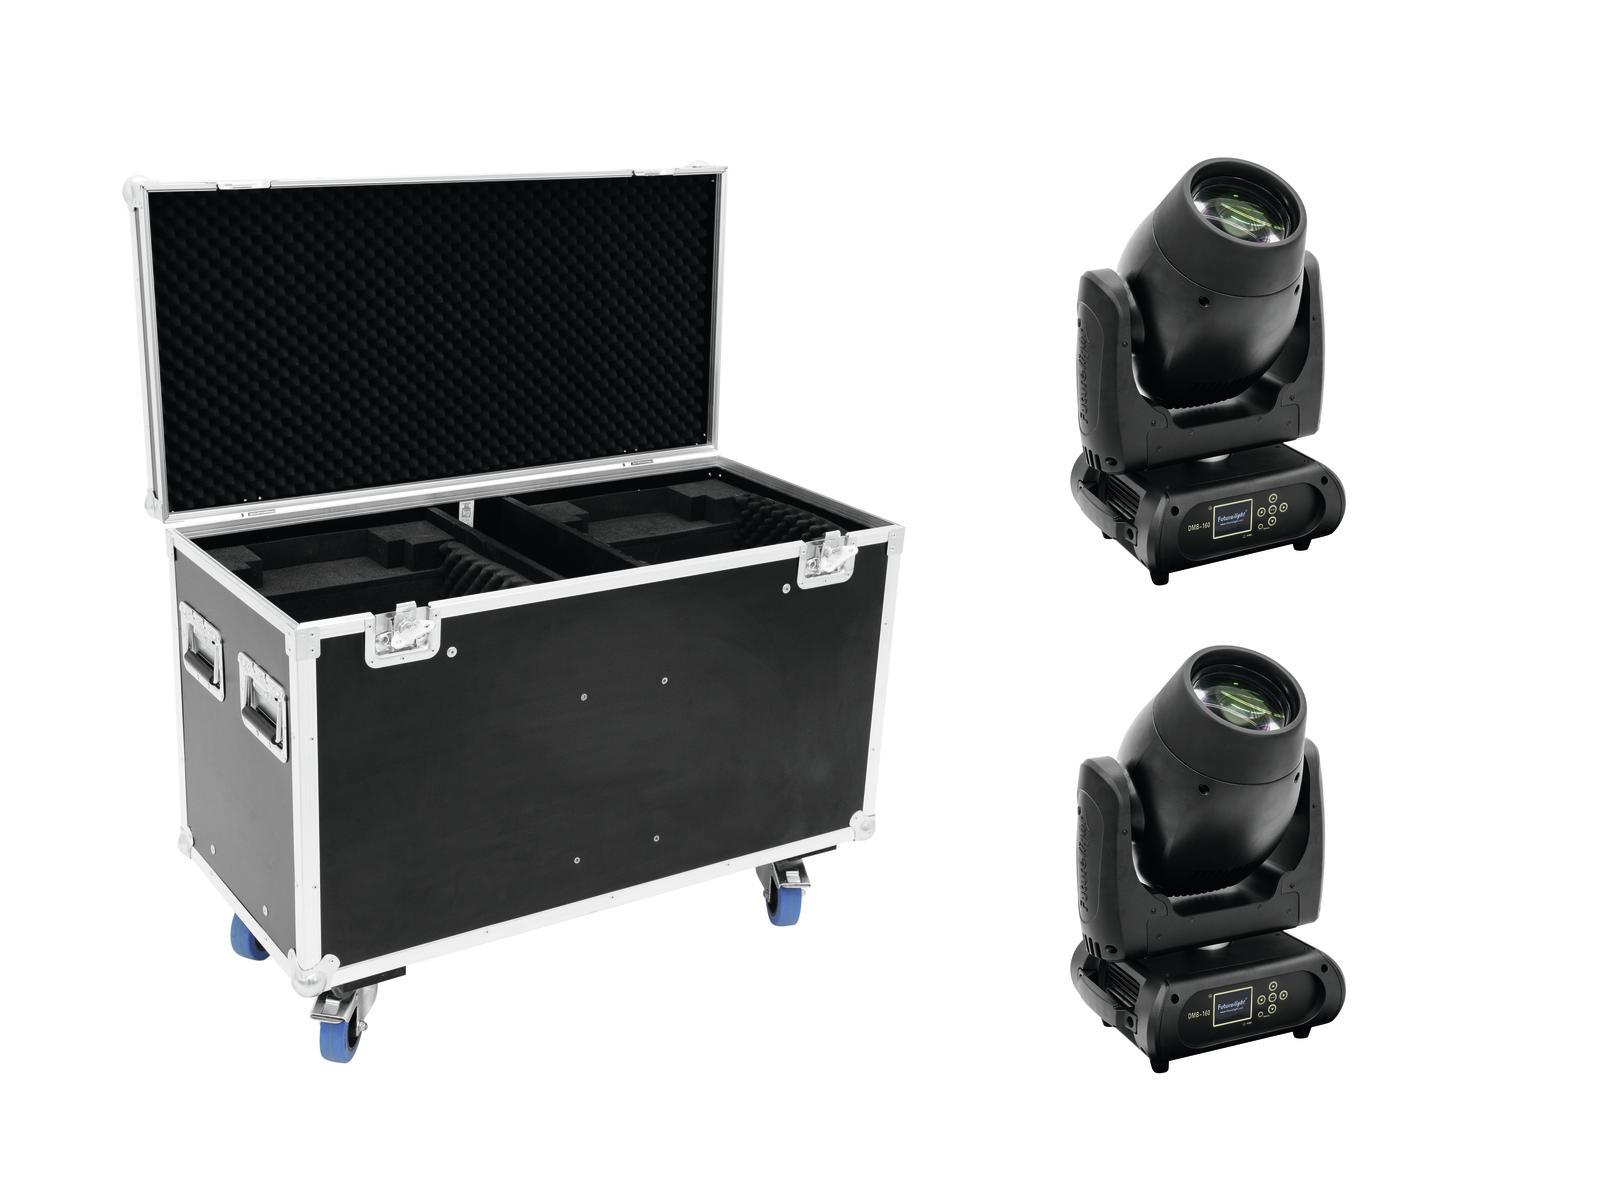 FUTURELIGHT Set 2x DMB-160 LED Moving-Head + Caso